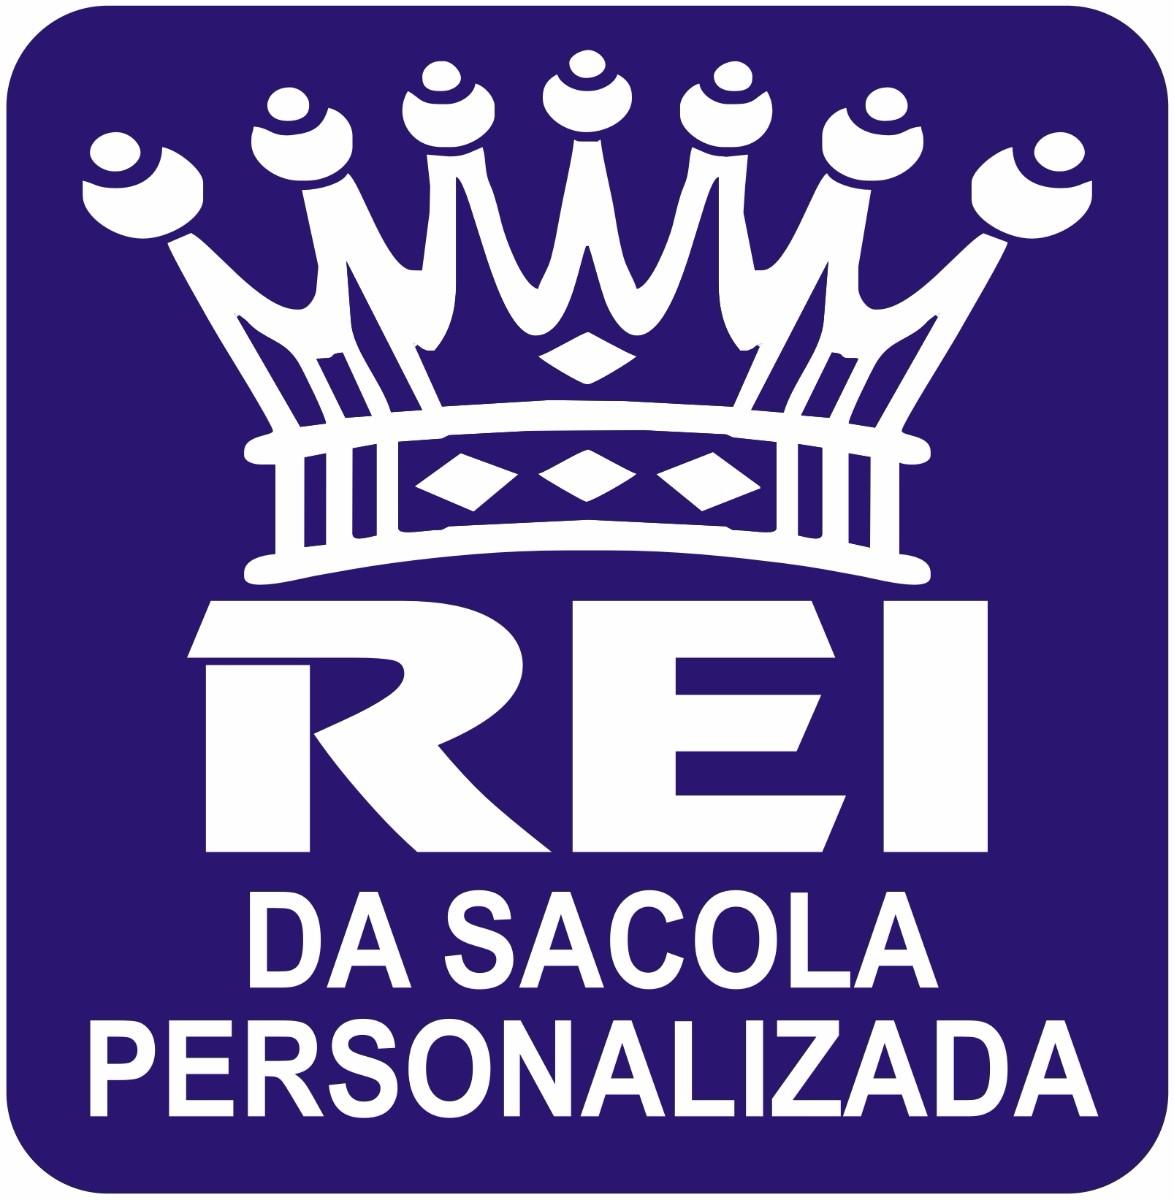 REISACOLA